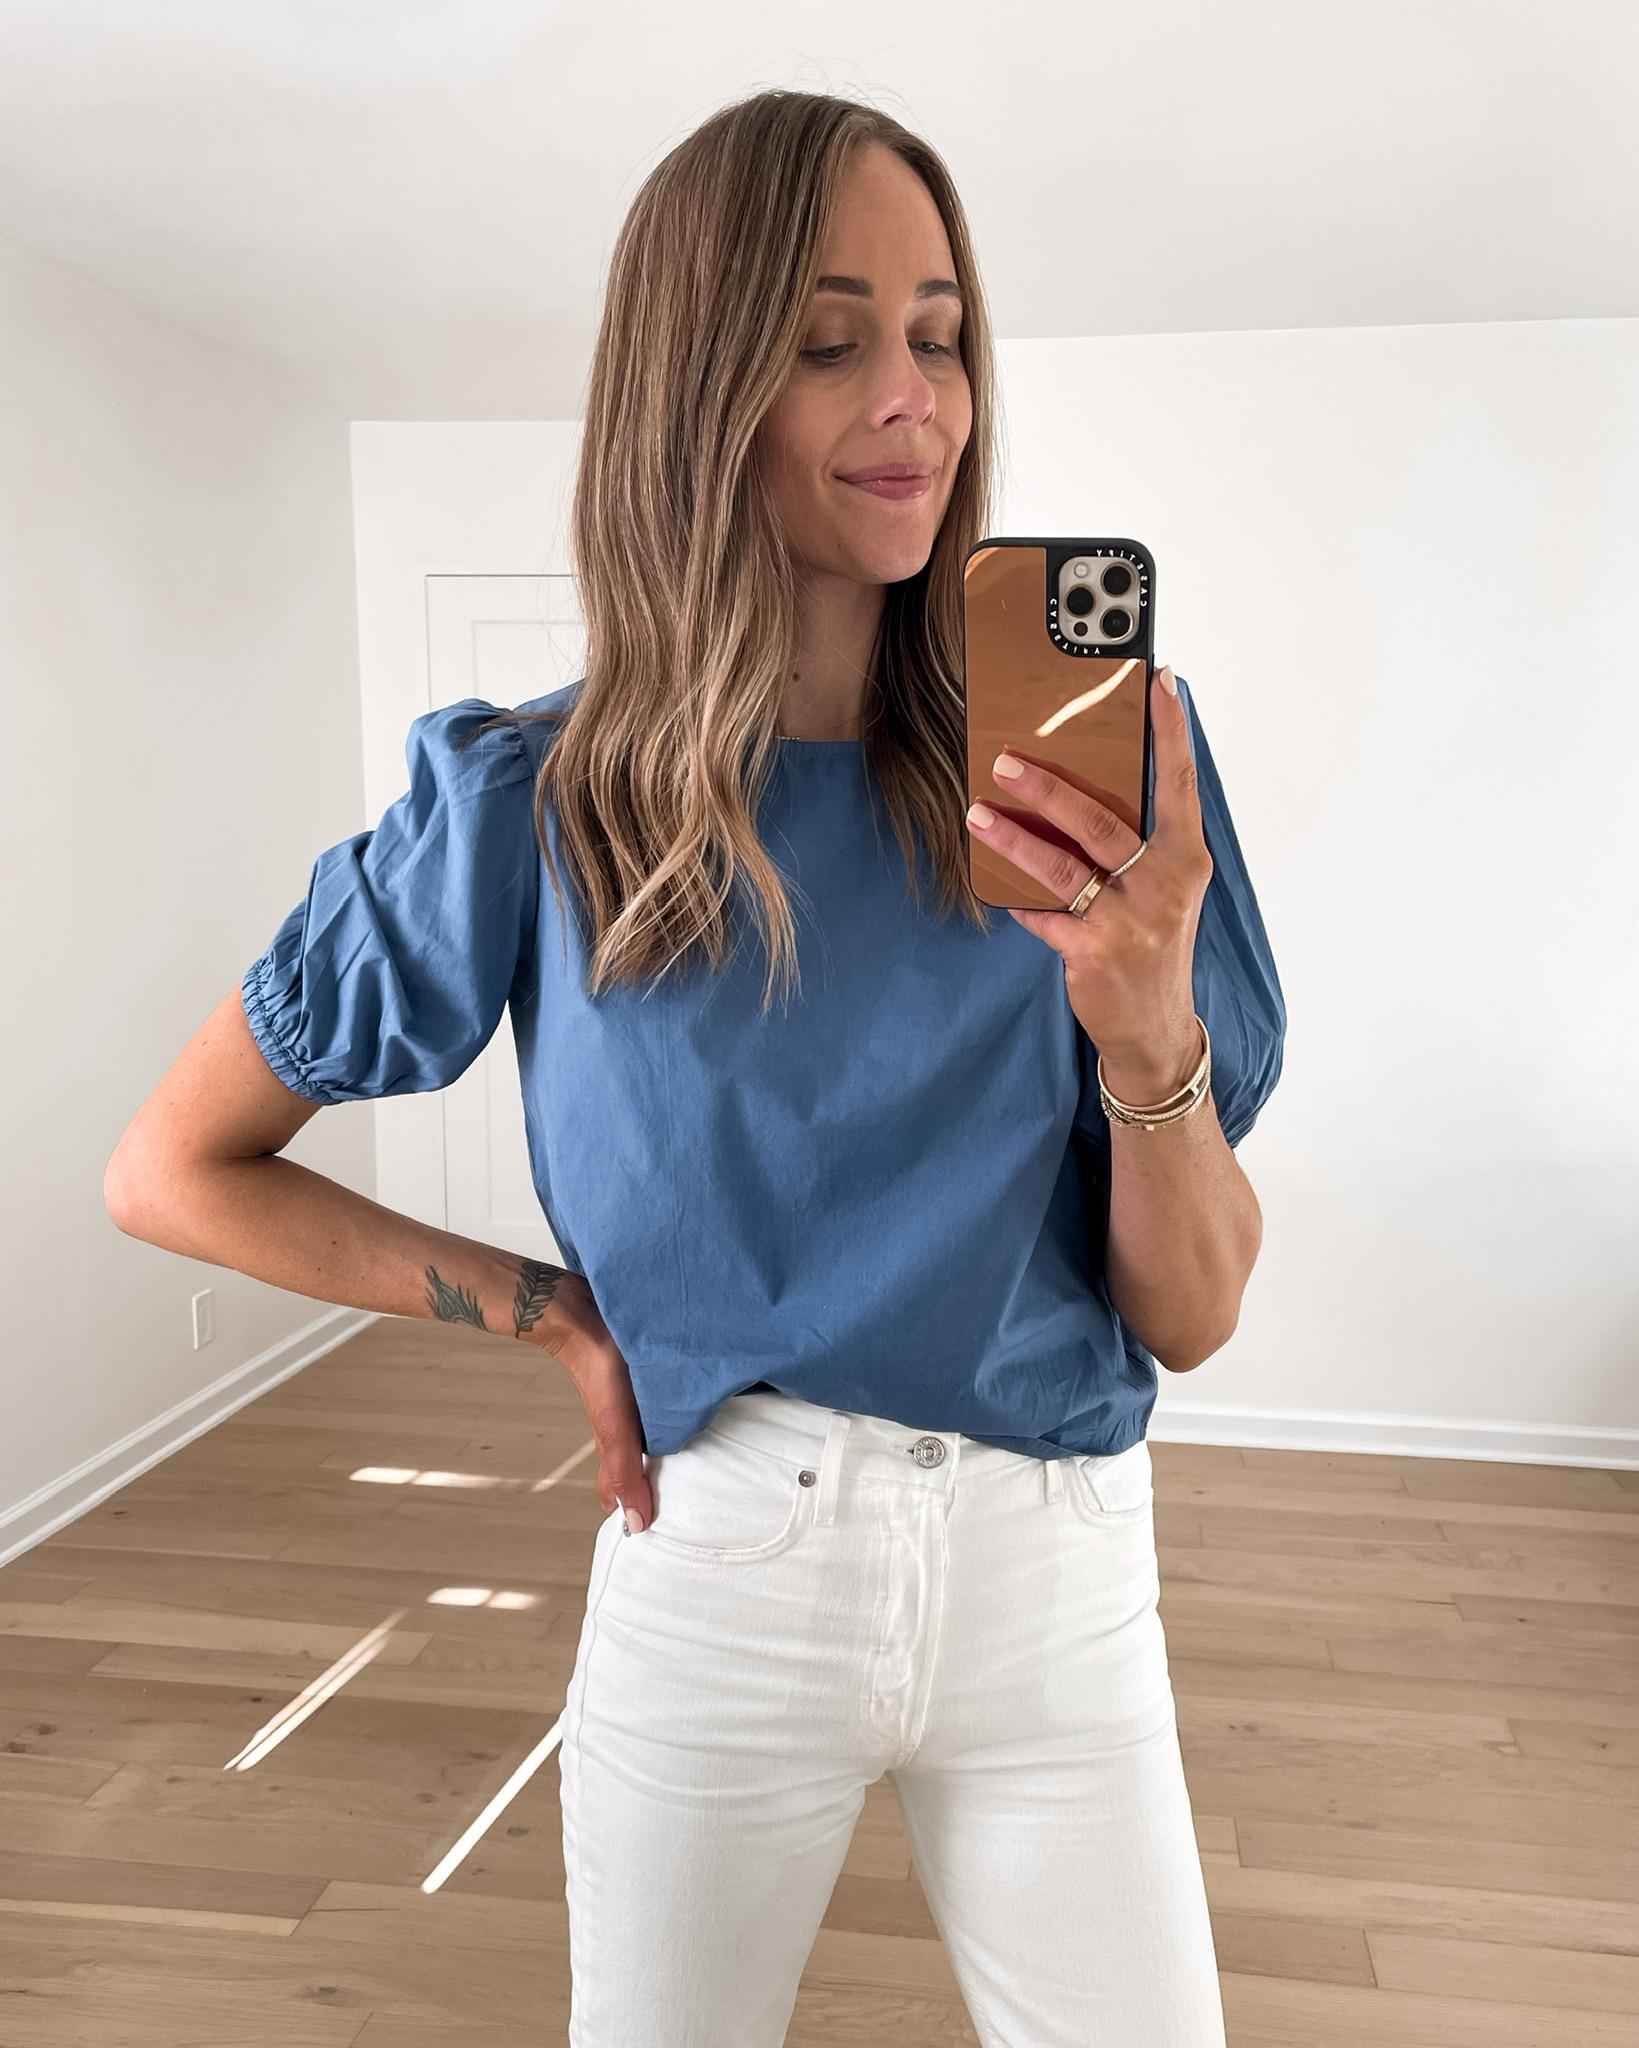 Fashion Jackson Wearing Amazon Fashion Blue Puff Sleeve Top White Jeans Tan Sandals